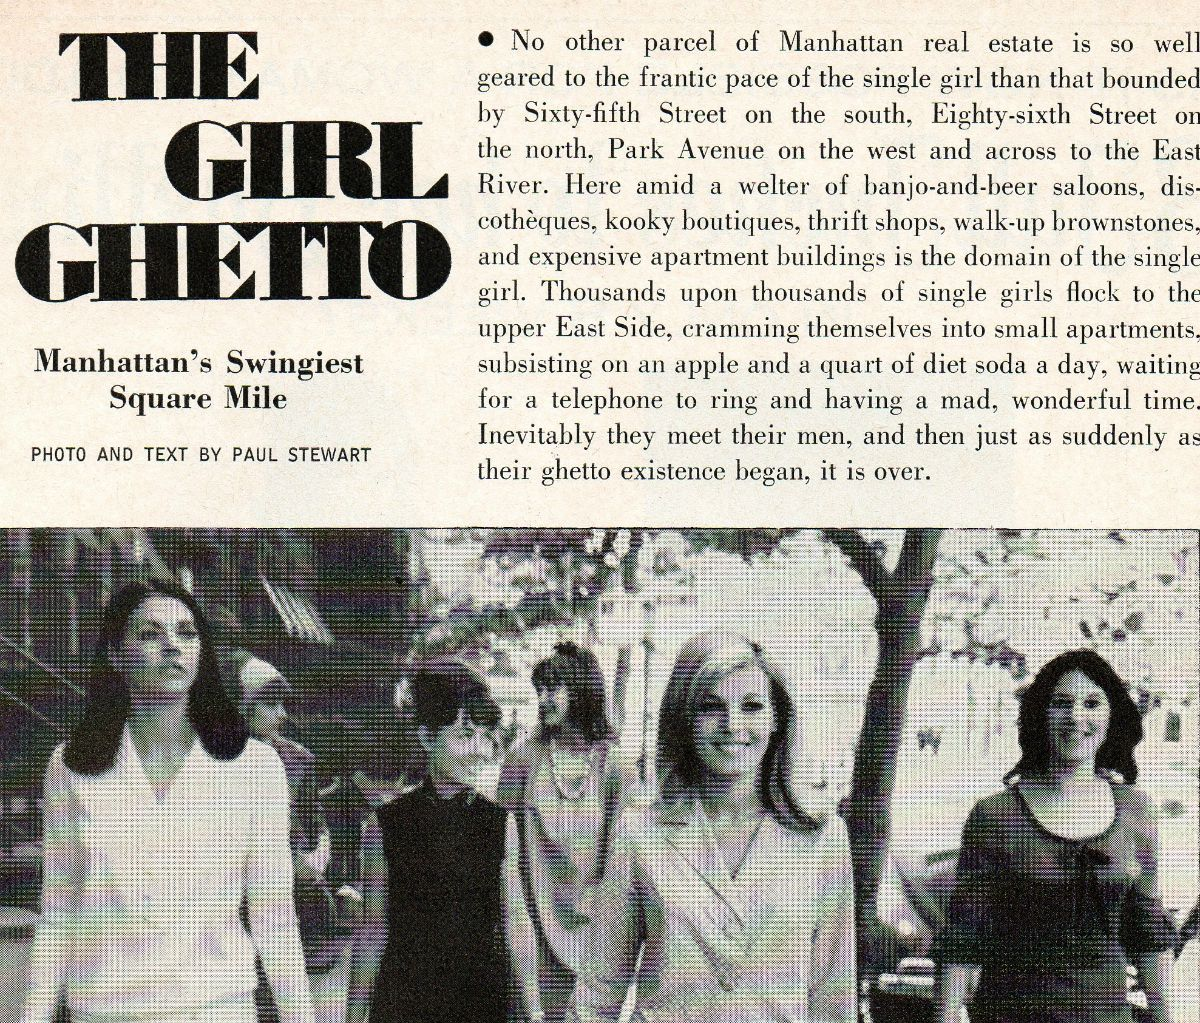 The Girl Ghetto, Upper East Side, New York in the 1960s